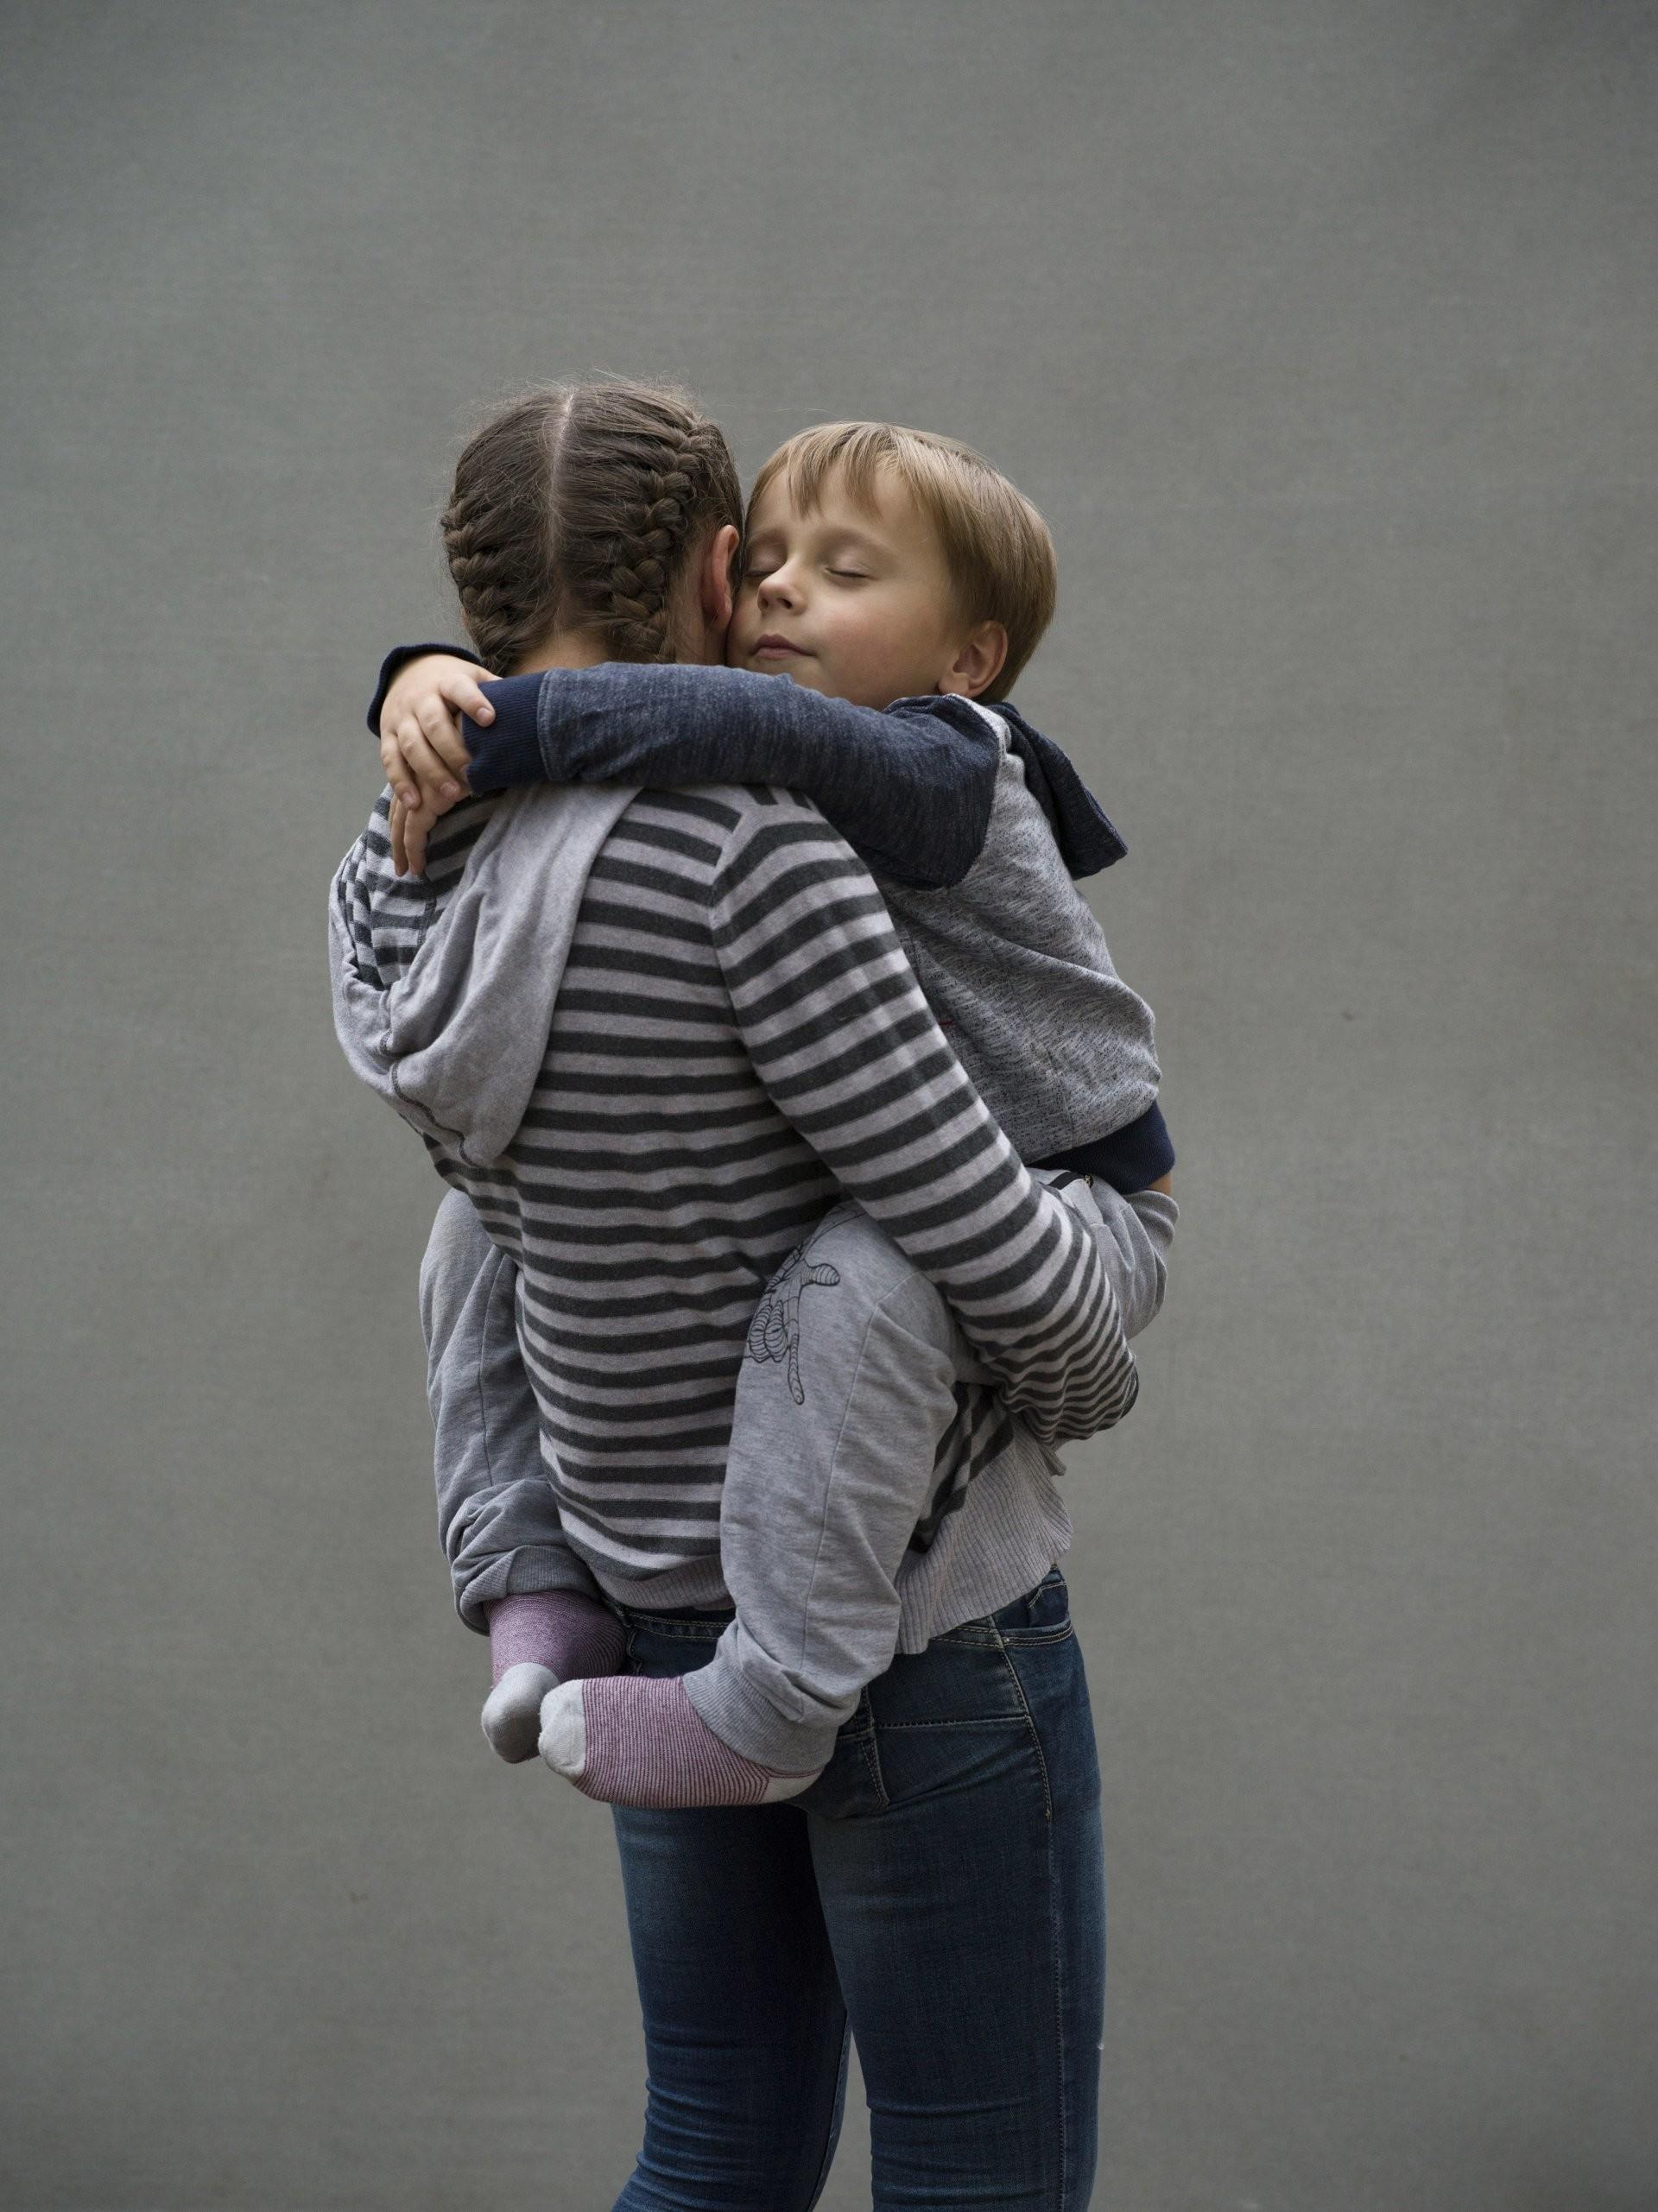 Kiev, Ukraine mother son HIv aids disease transmission birth pregnancy positive negative